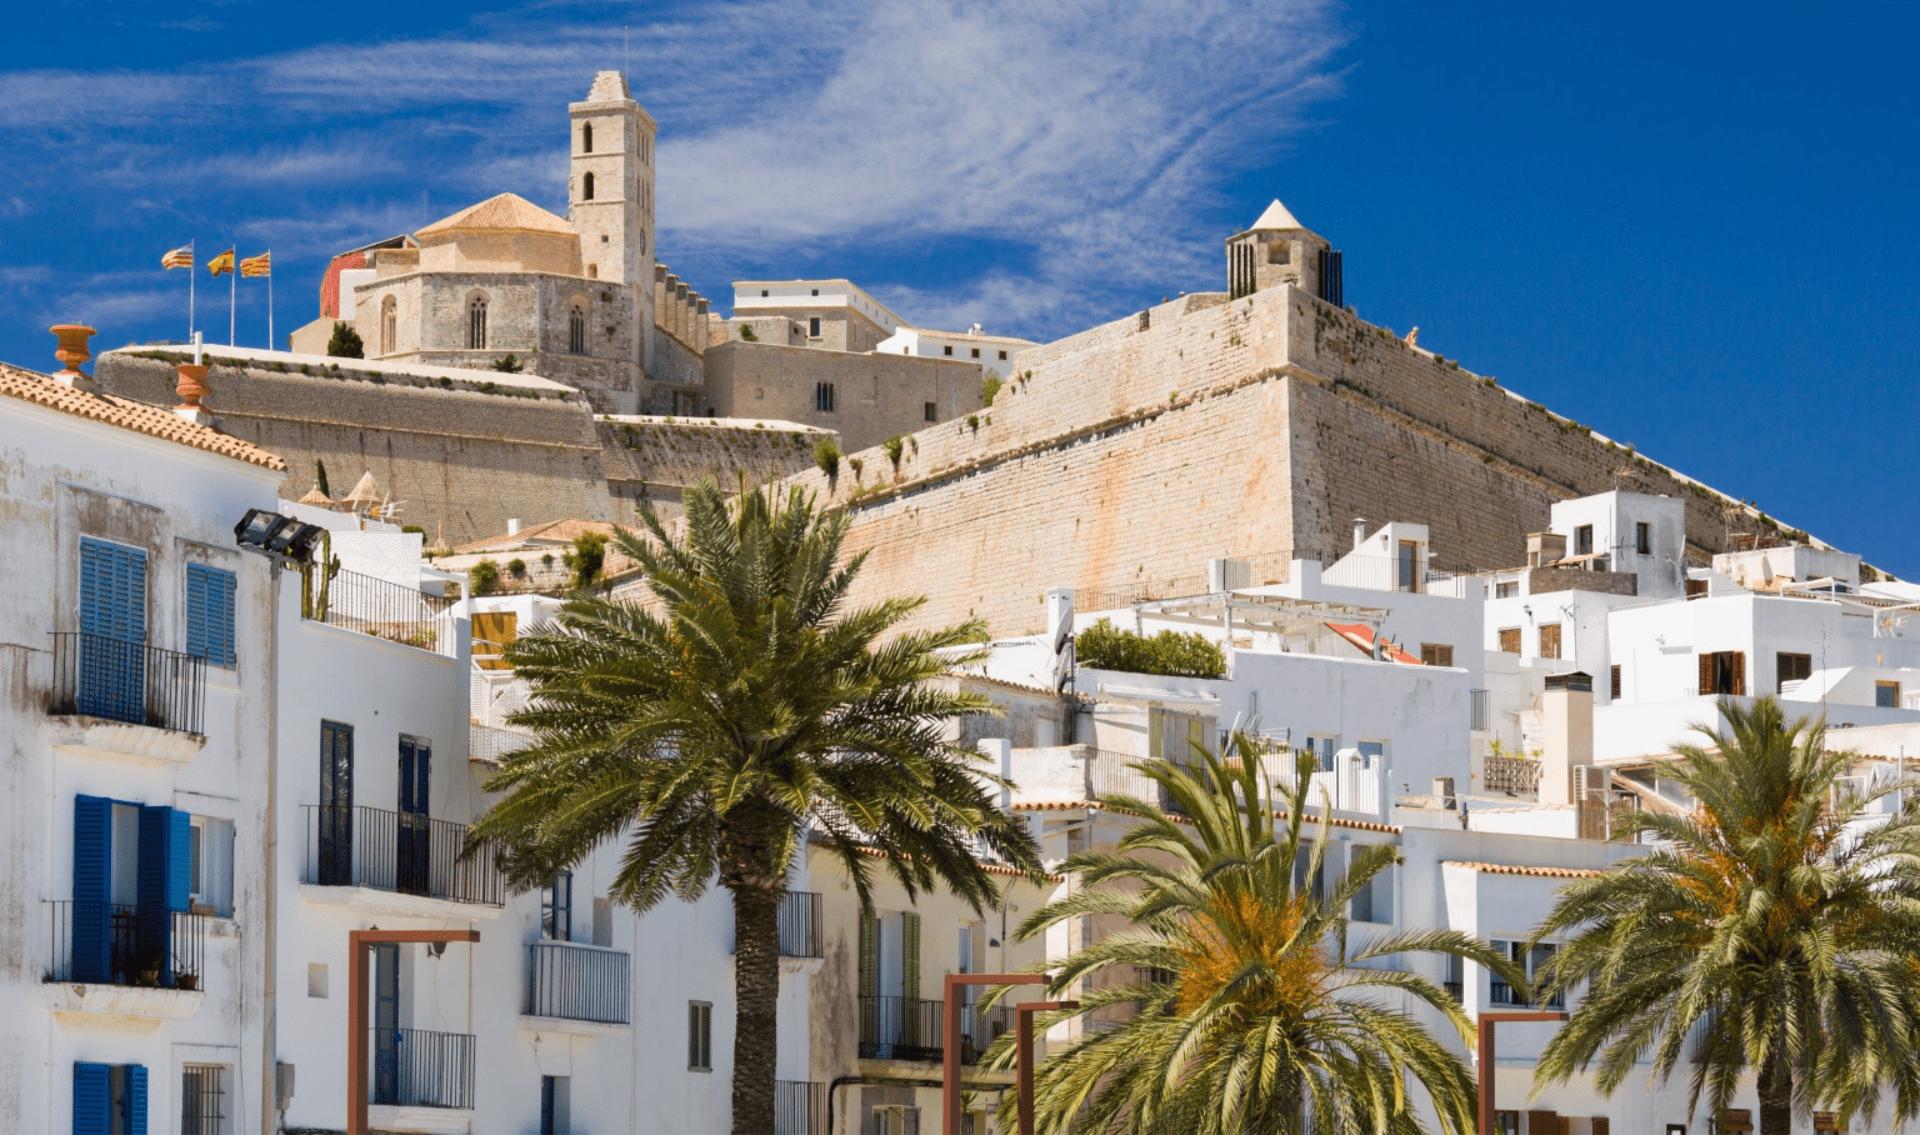 Fietsvakantie Ibiza (groepsreis)